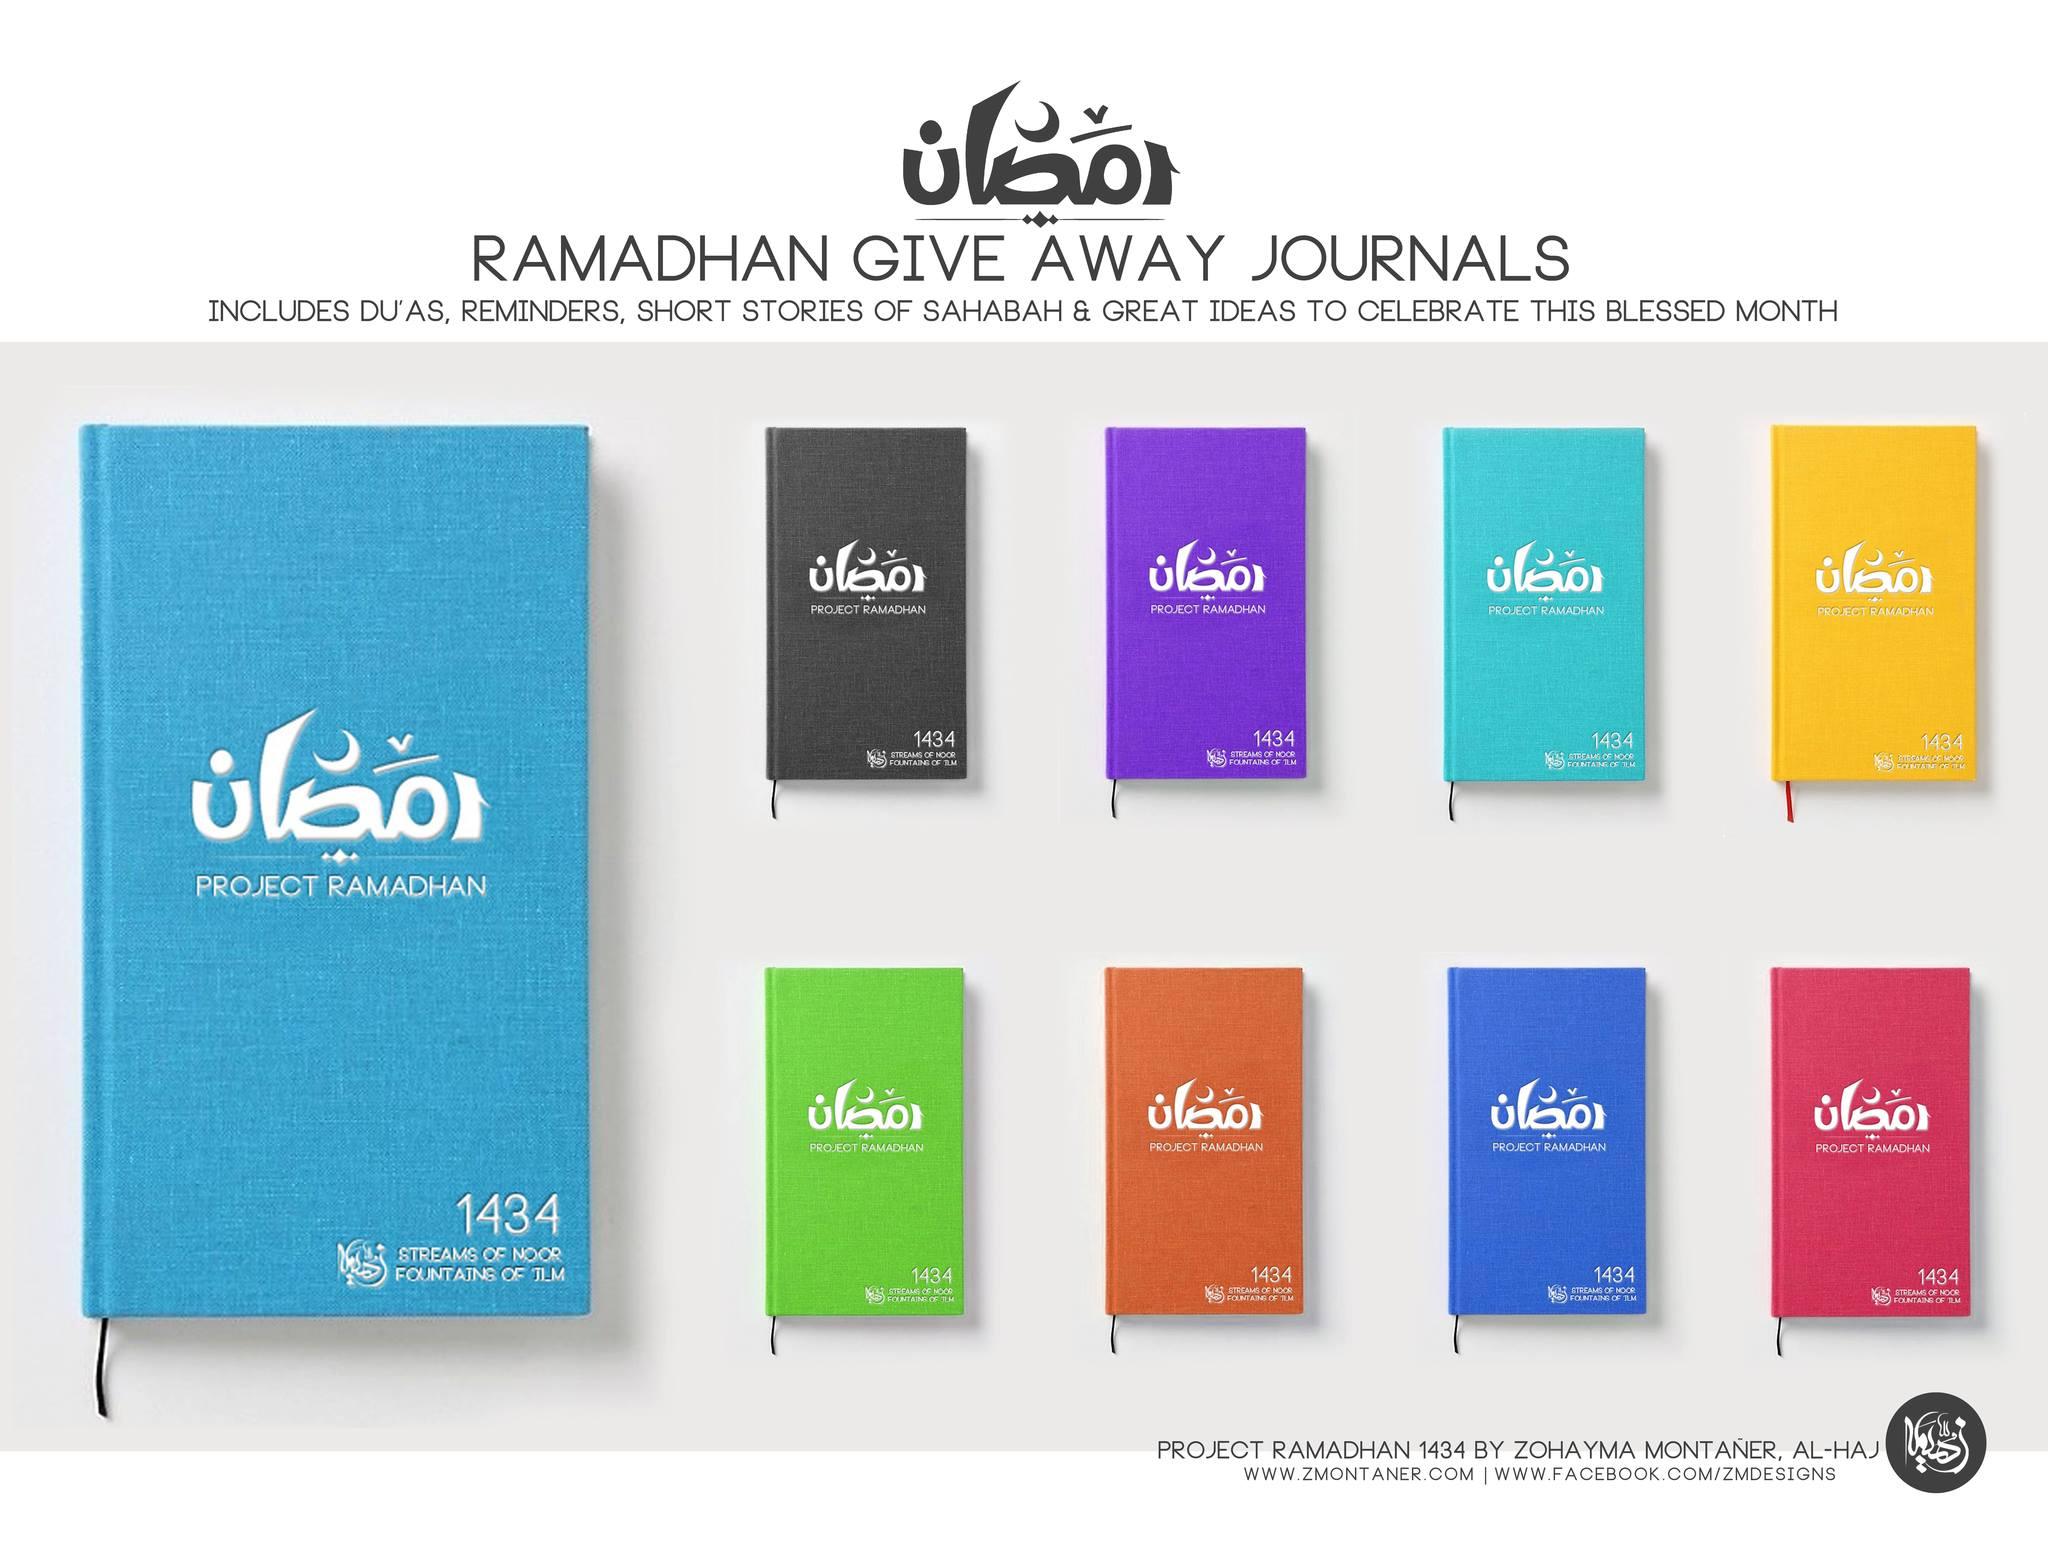 carnet de ramadan Zohayma Montañer Designs